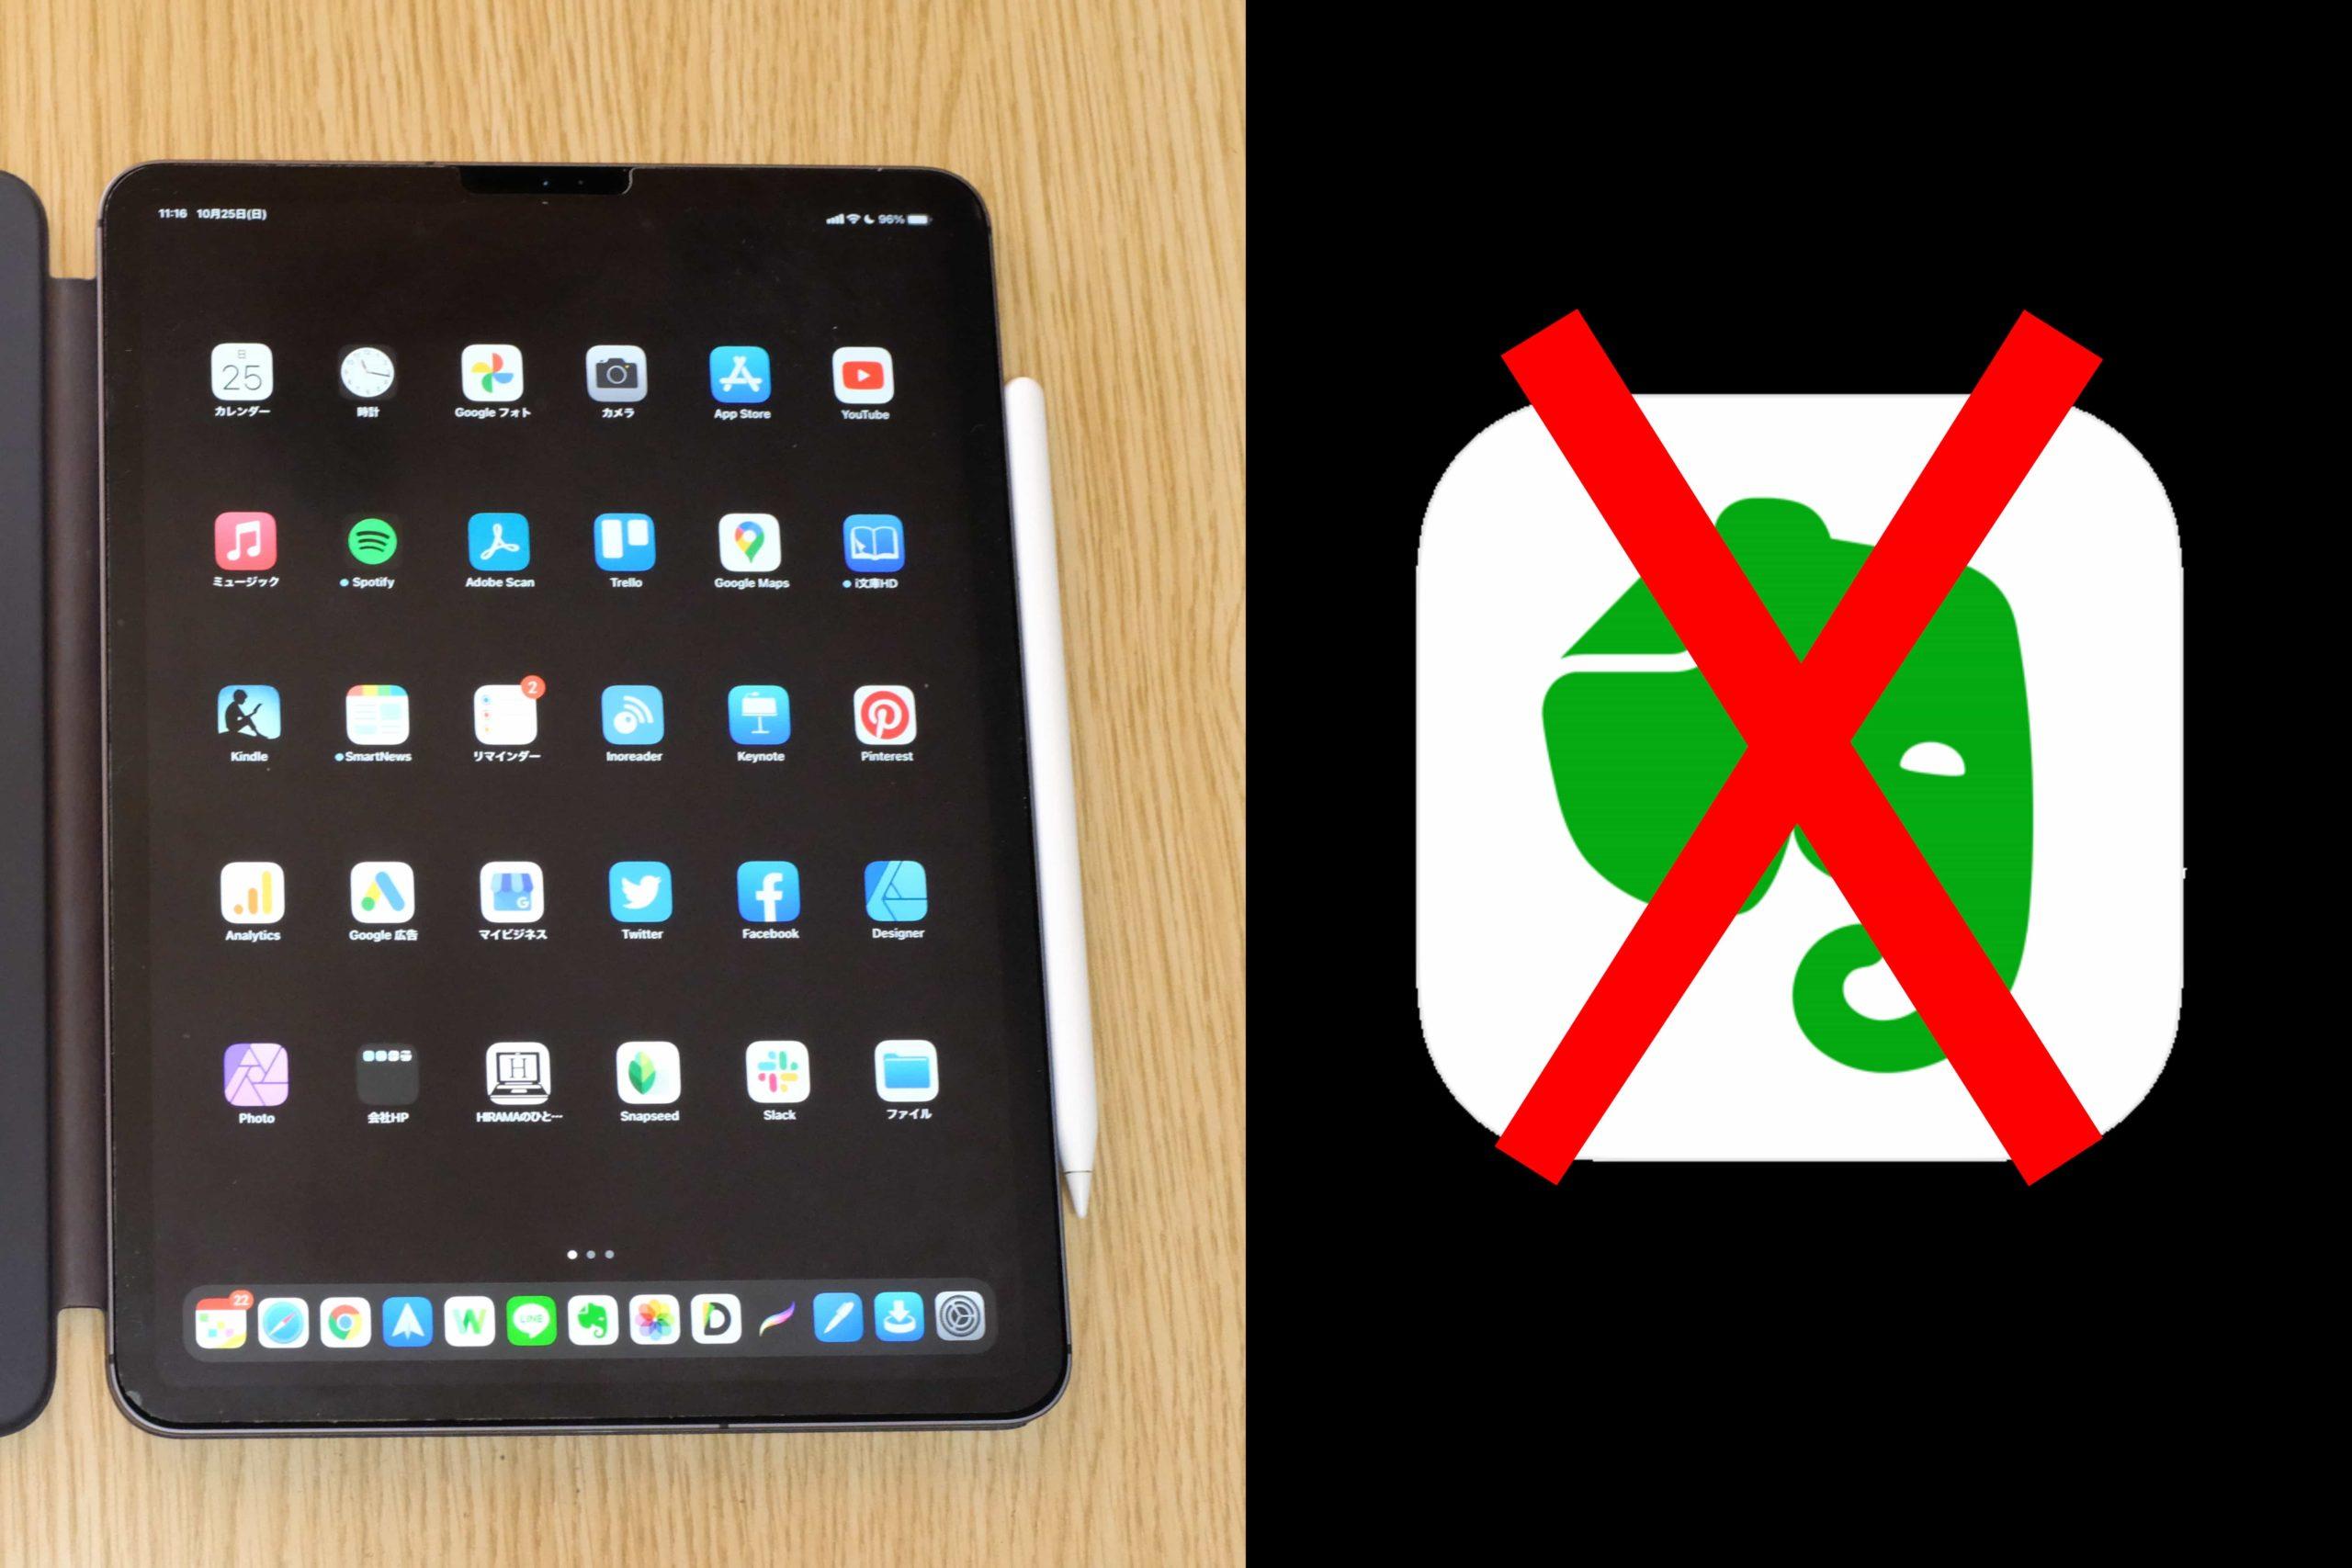 iPadのEvernoteアプリが悲しいくらい反応、動きが悪い話